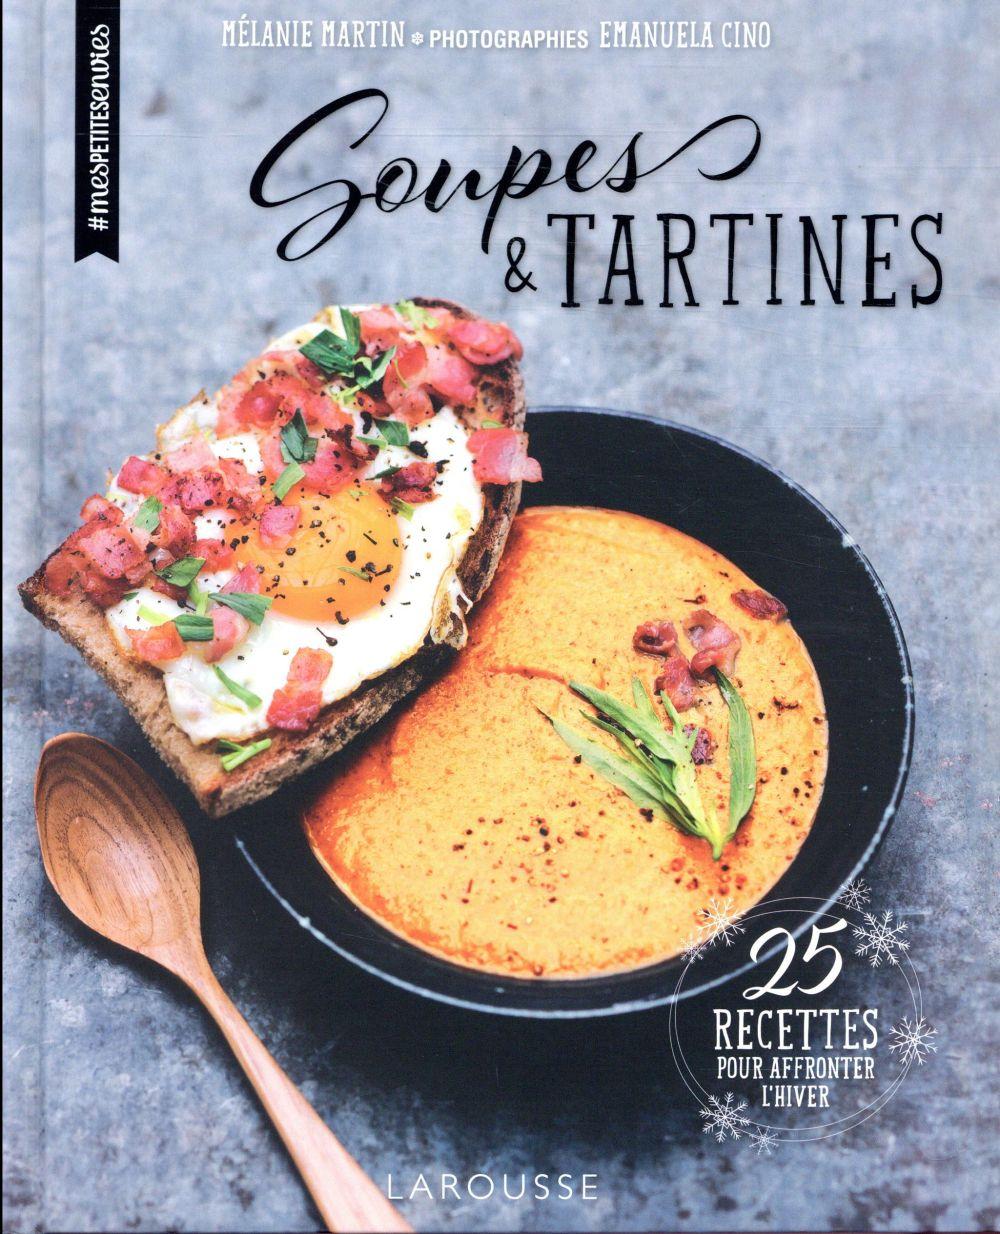 soupes & tartines